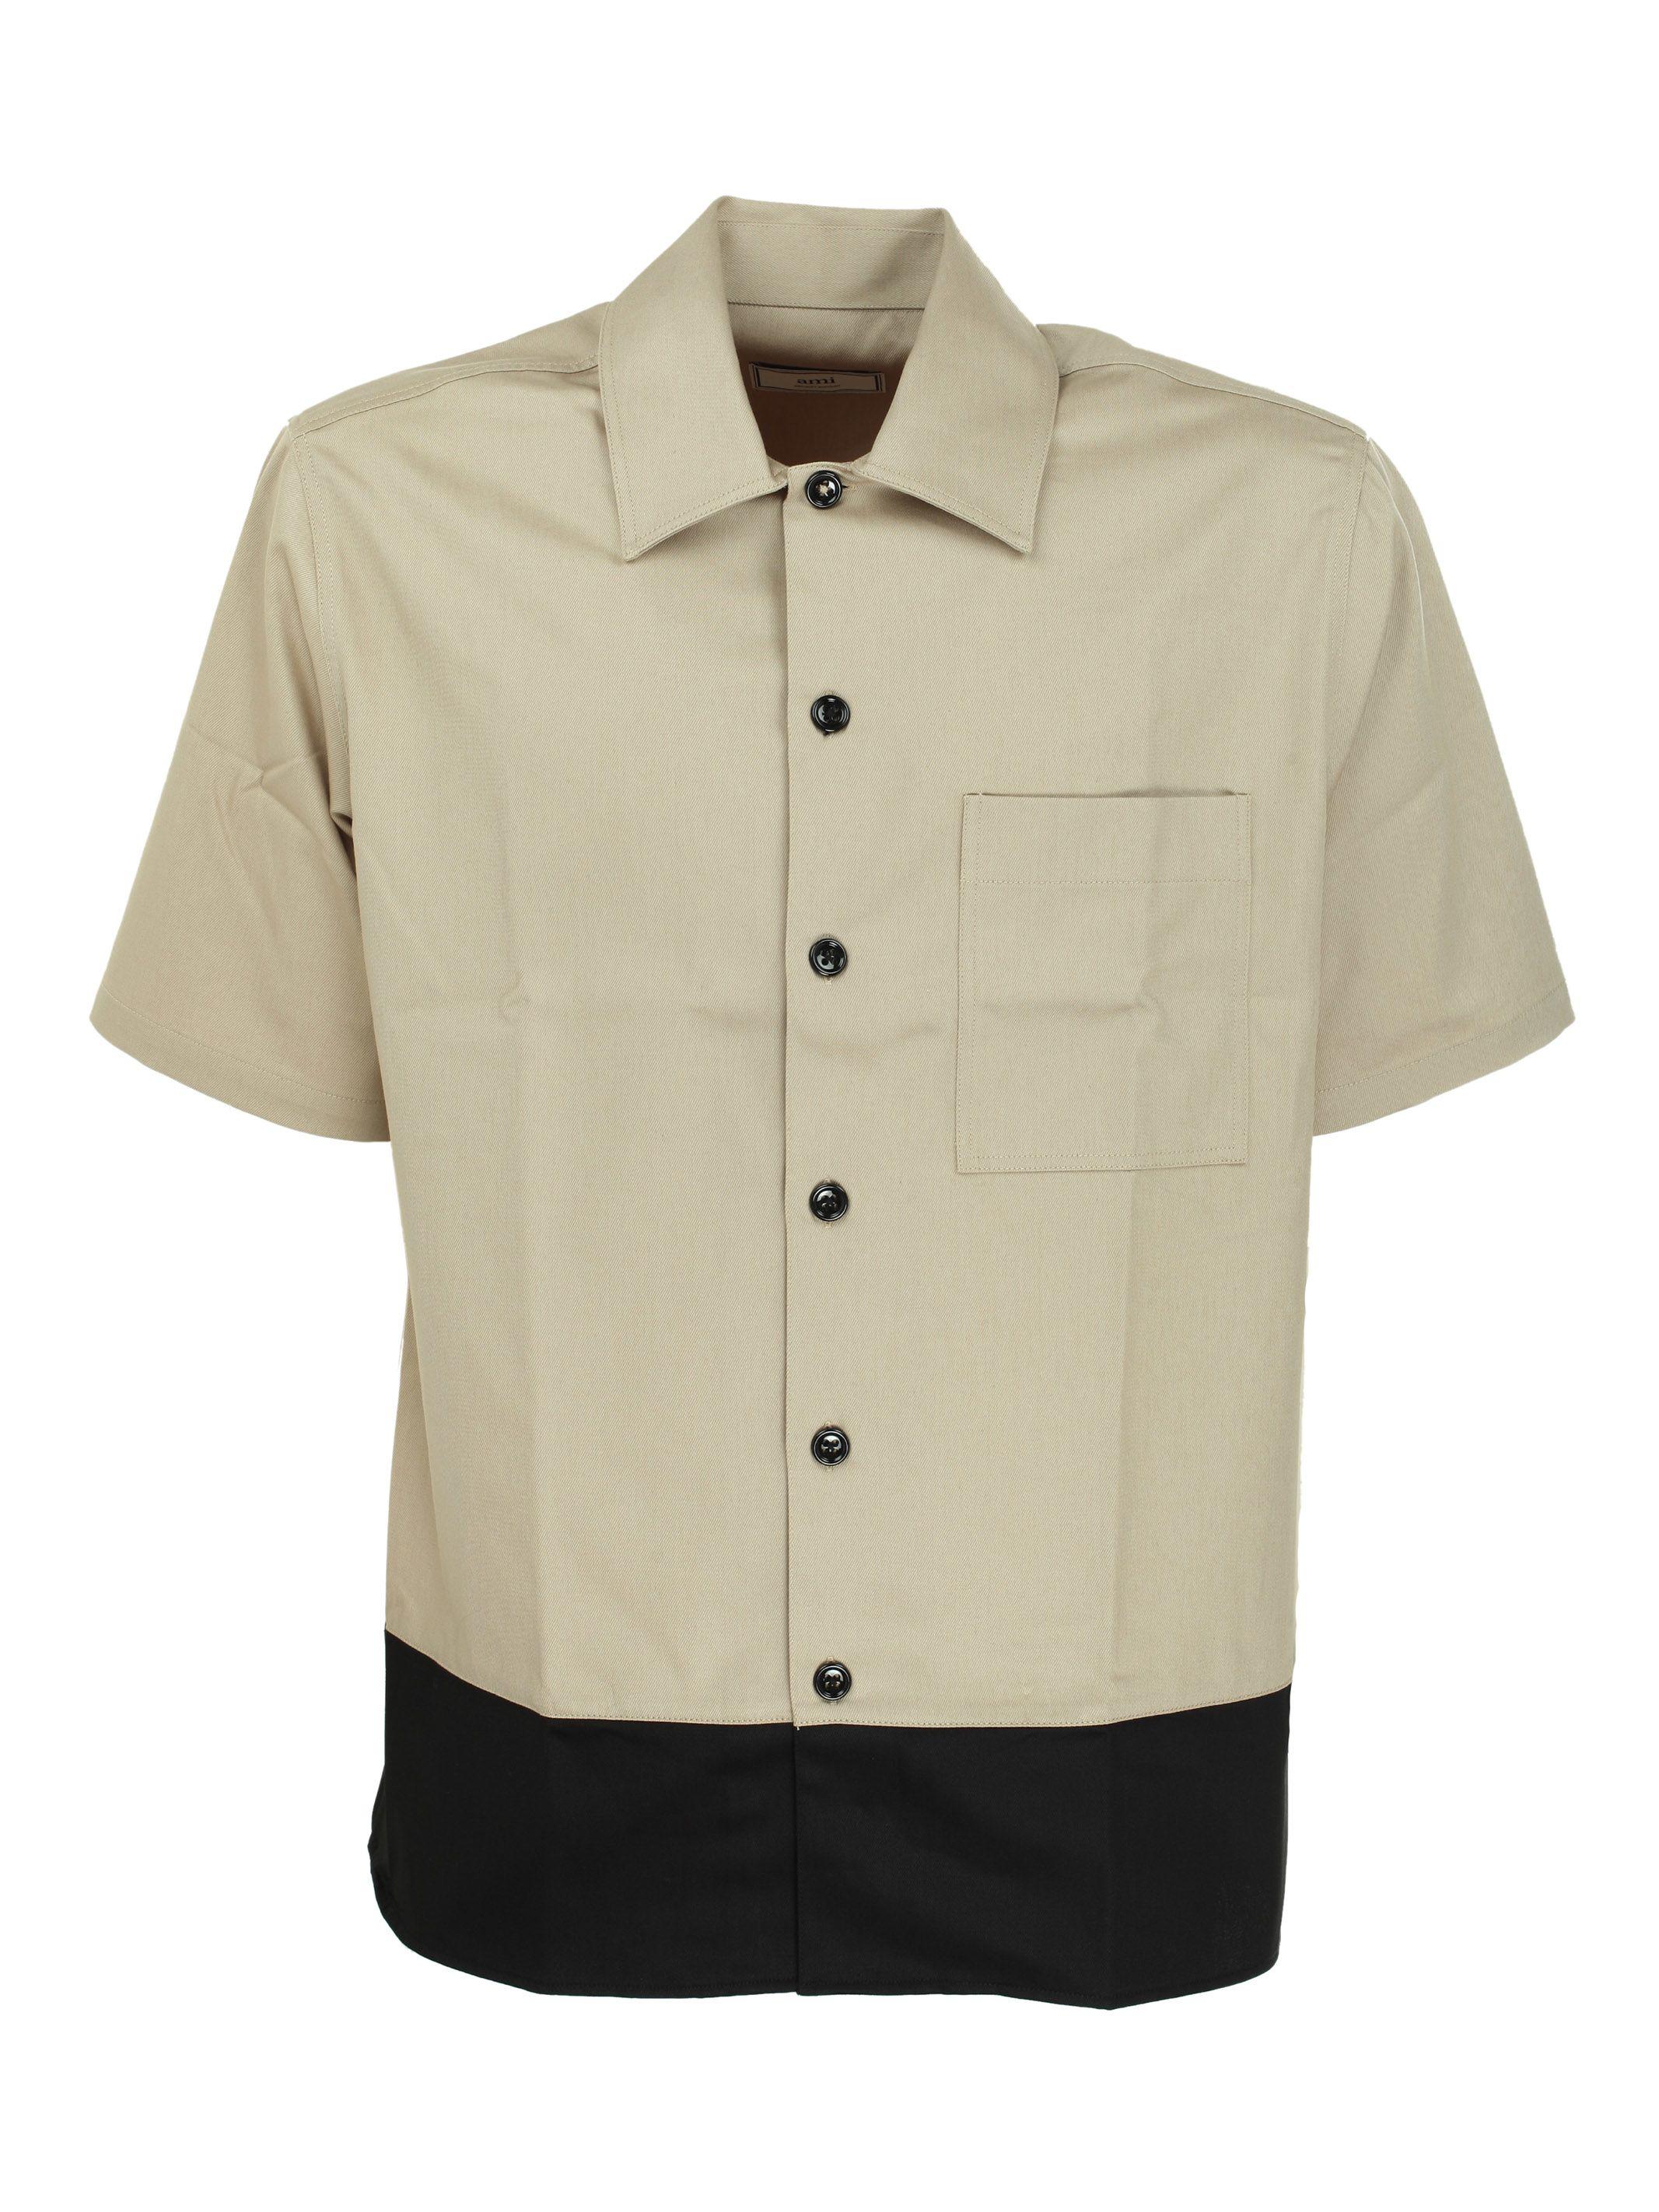 Ami Alexandre Mattiussi Alexandre Mattiussi Short Sleeve Shirt